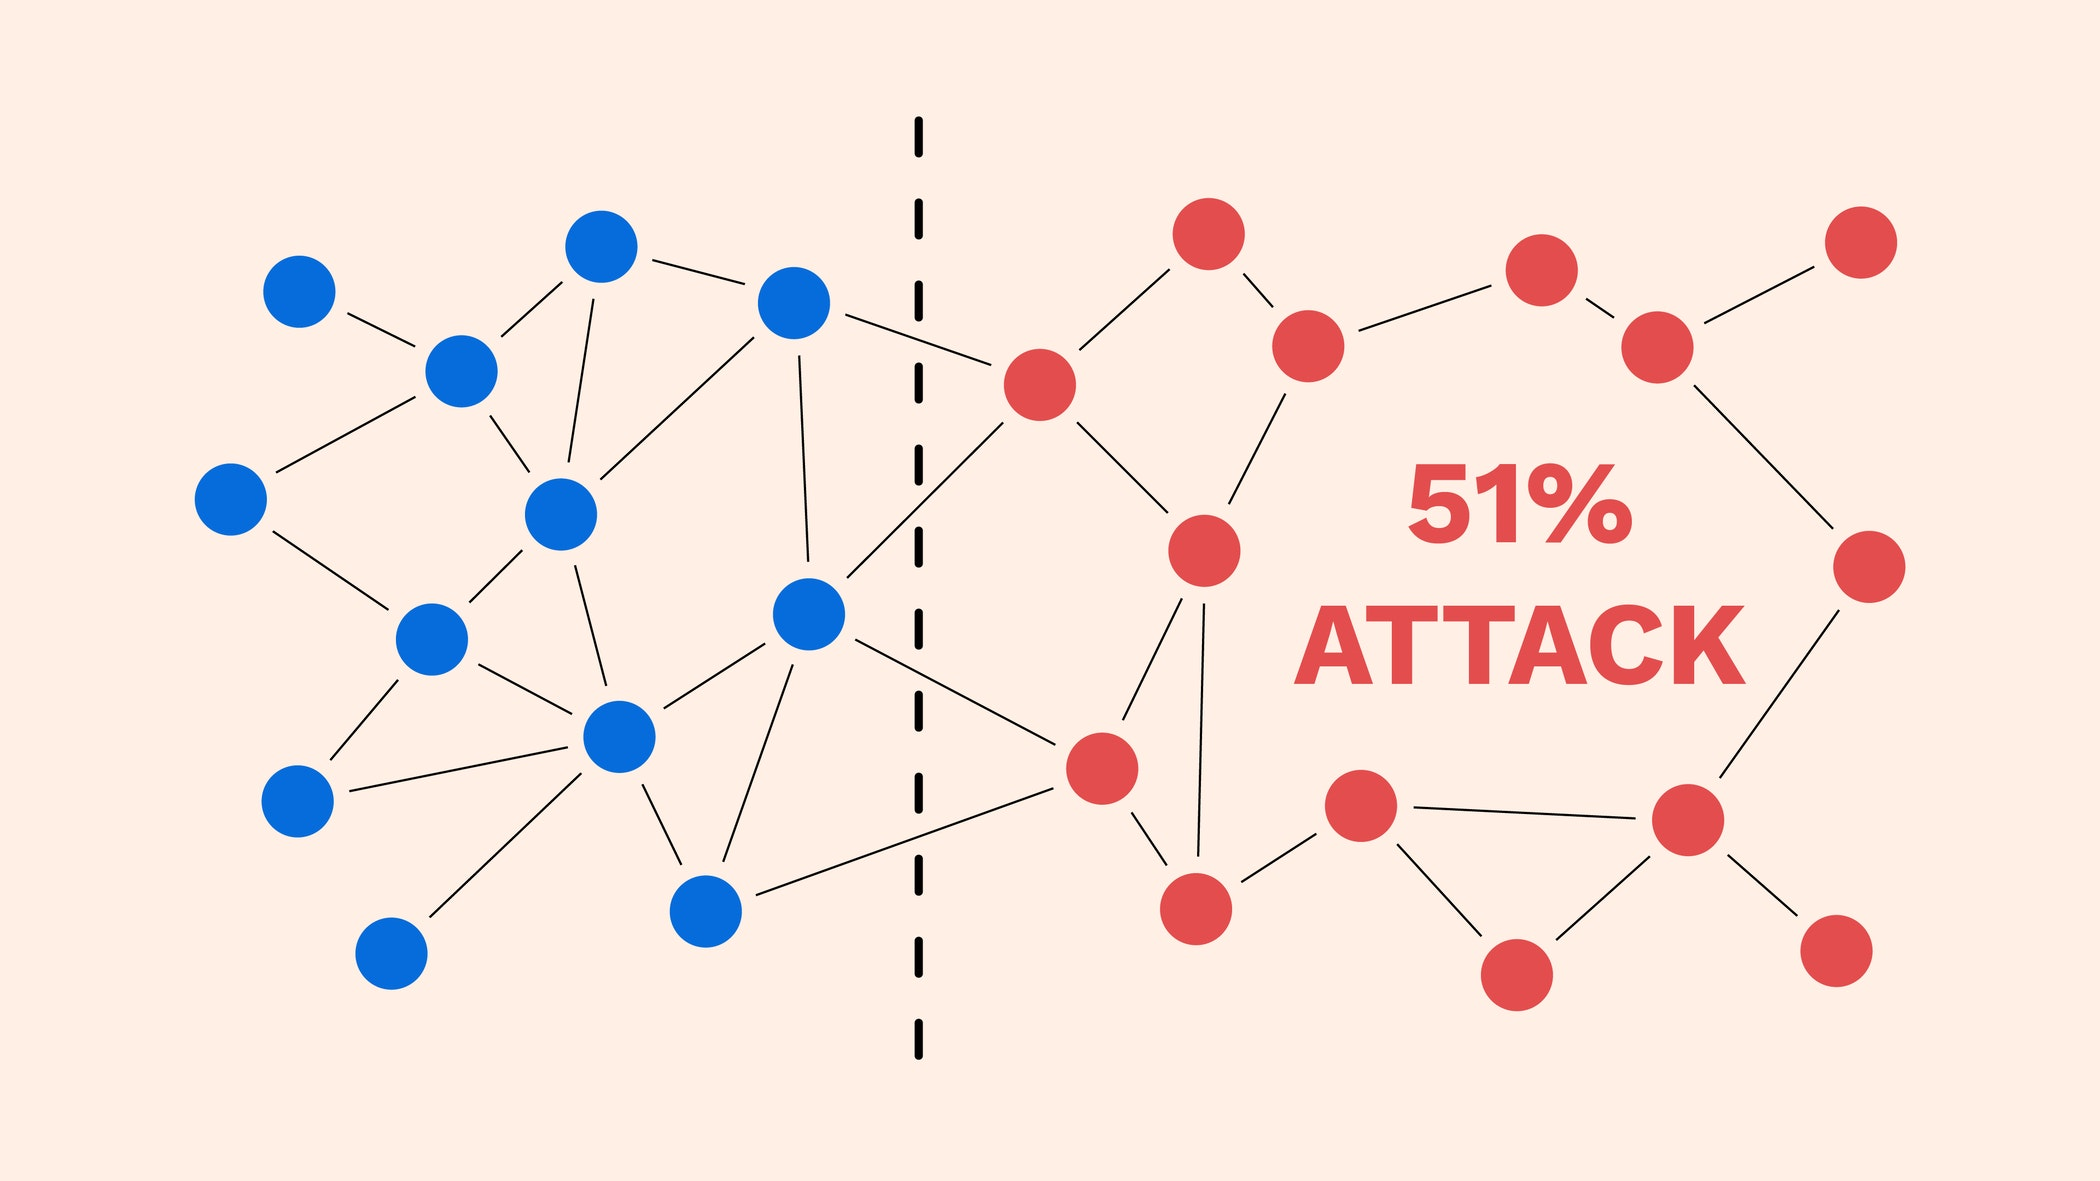 حمله ۵۱ درصد